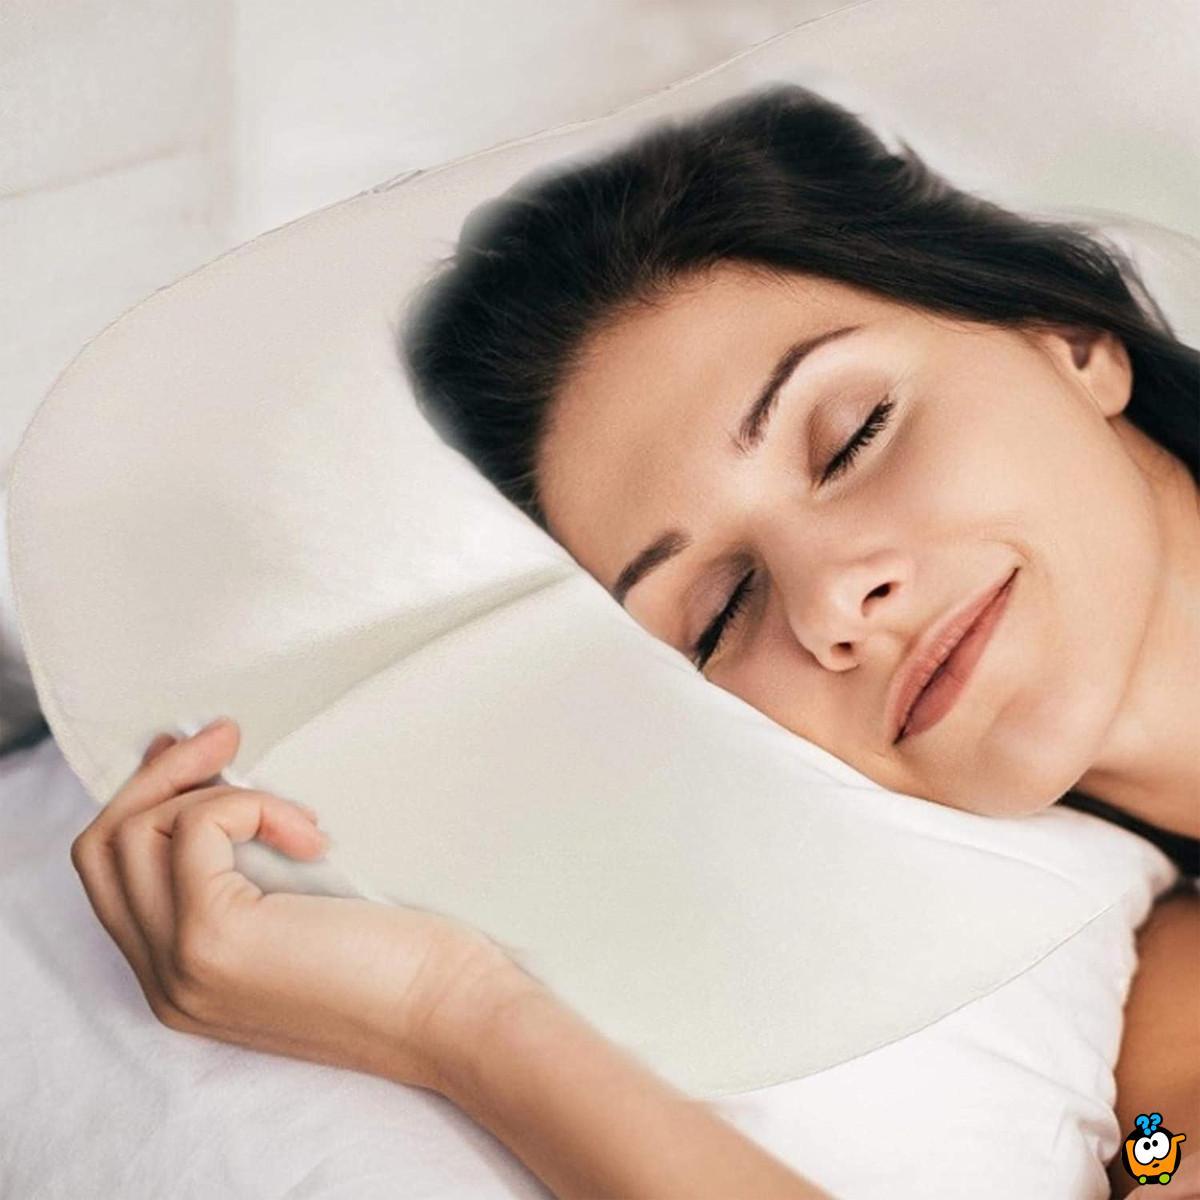 Dream pillow - jastuk za kvalitetan san